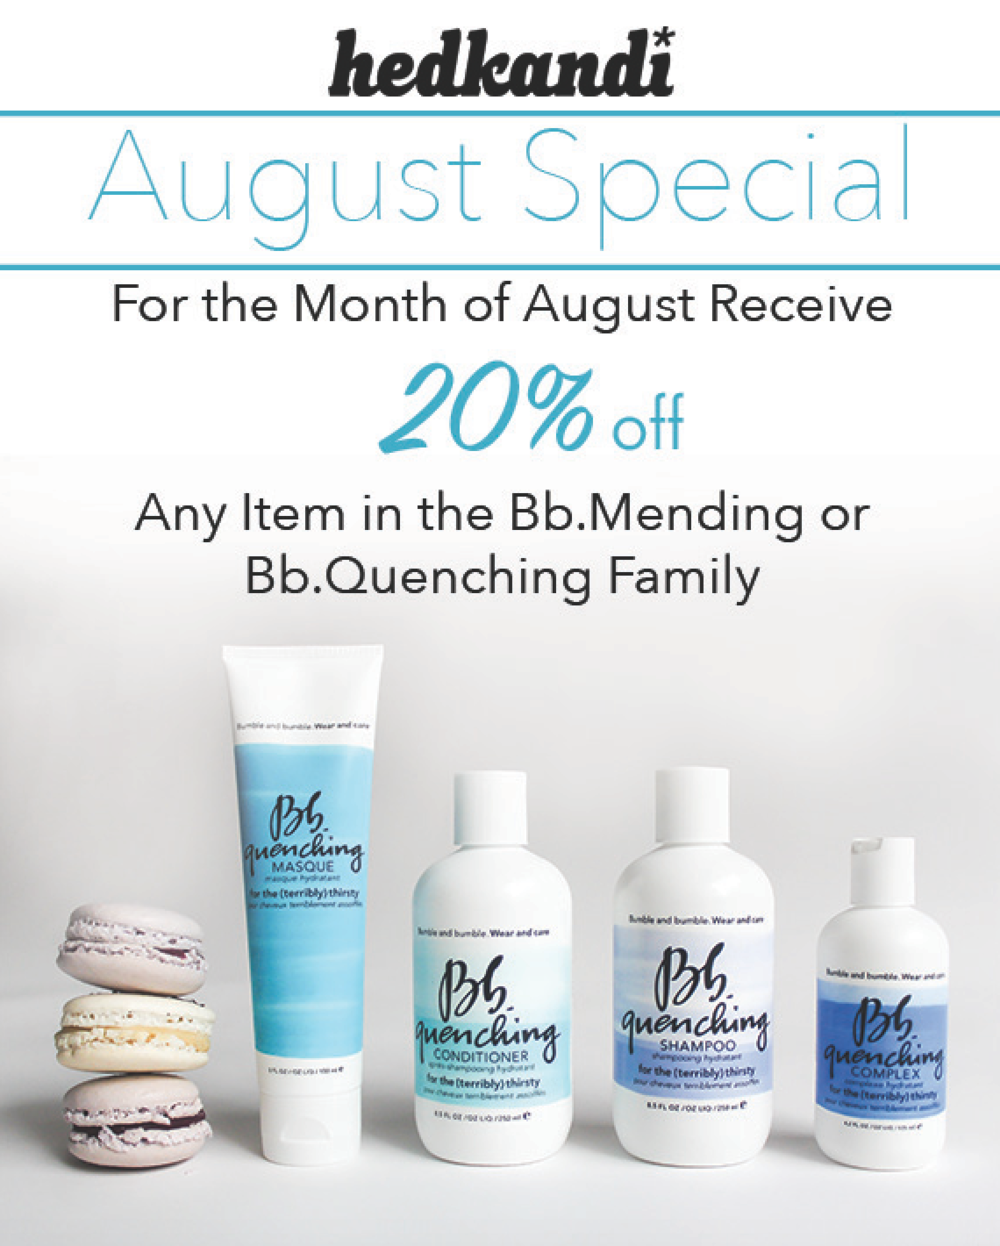 Hedkandi August Treatment Promotion